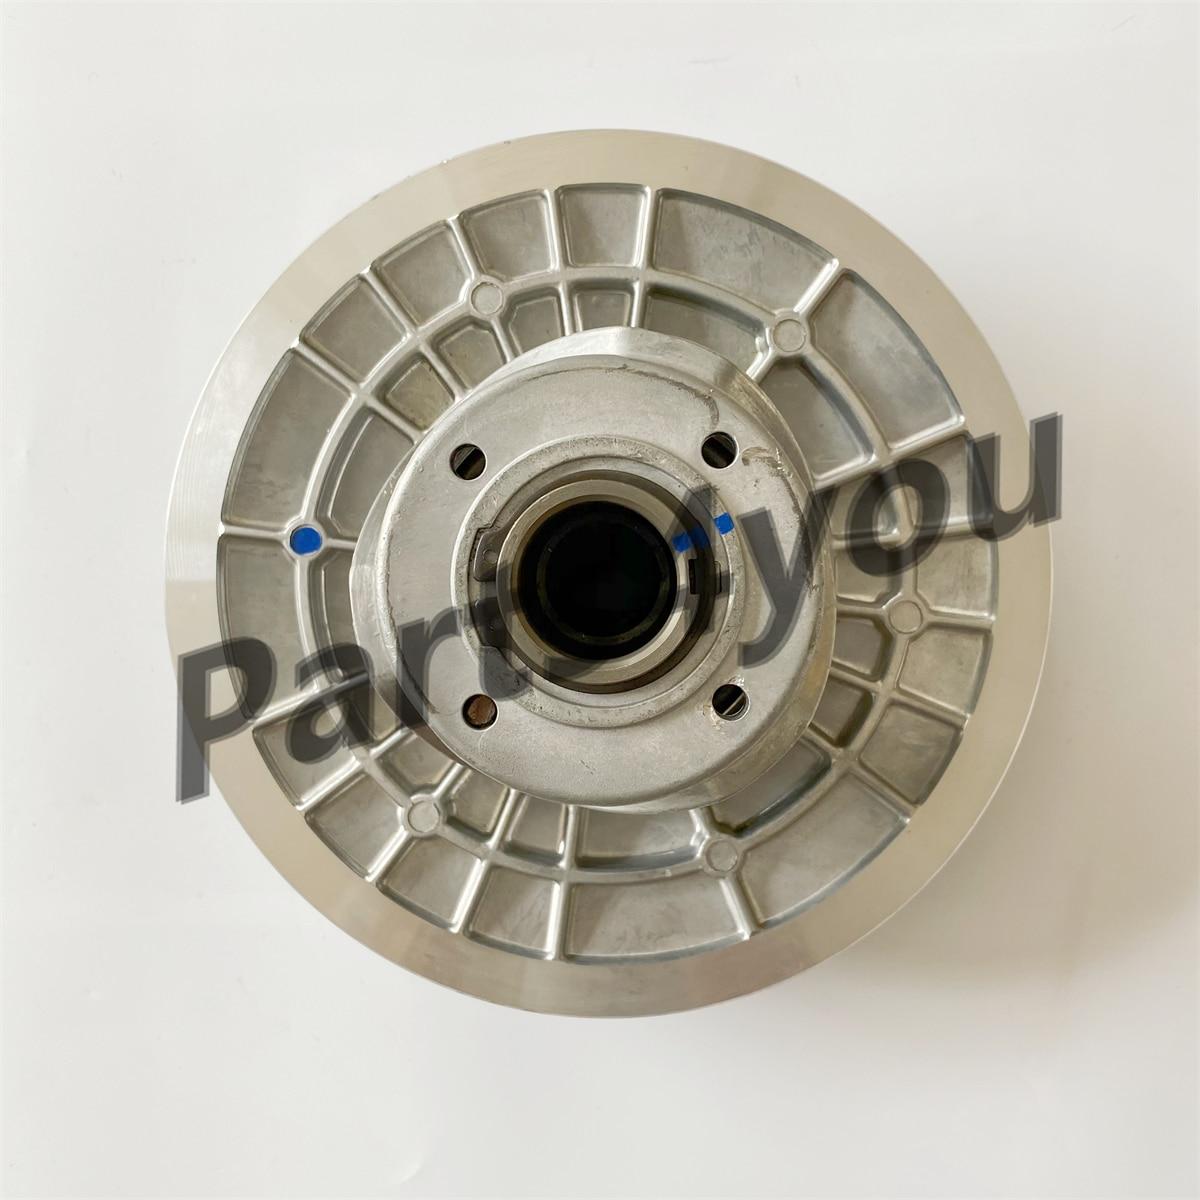 Secondary Clutch Driven Pulley sheave Variator Set for CFMoto 800 CF800 U8 Z8  CForce 800CC  ATV Quad UTV 0800-052000-0001 enlarge